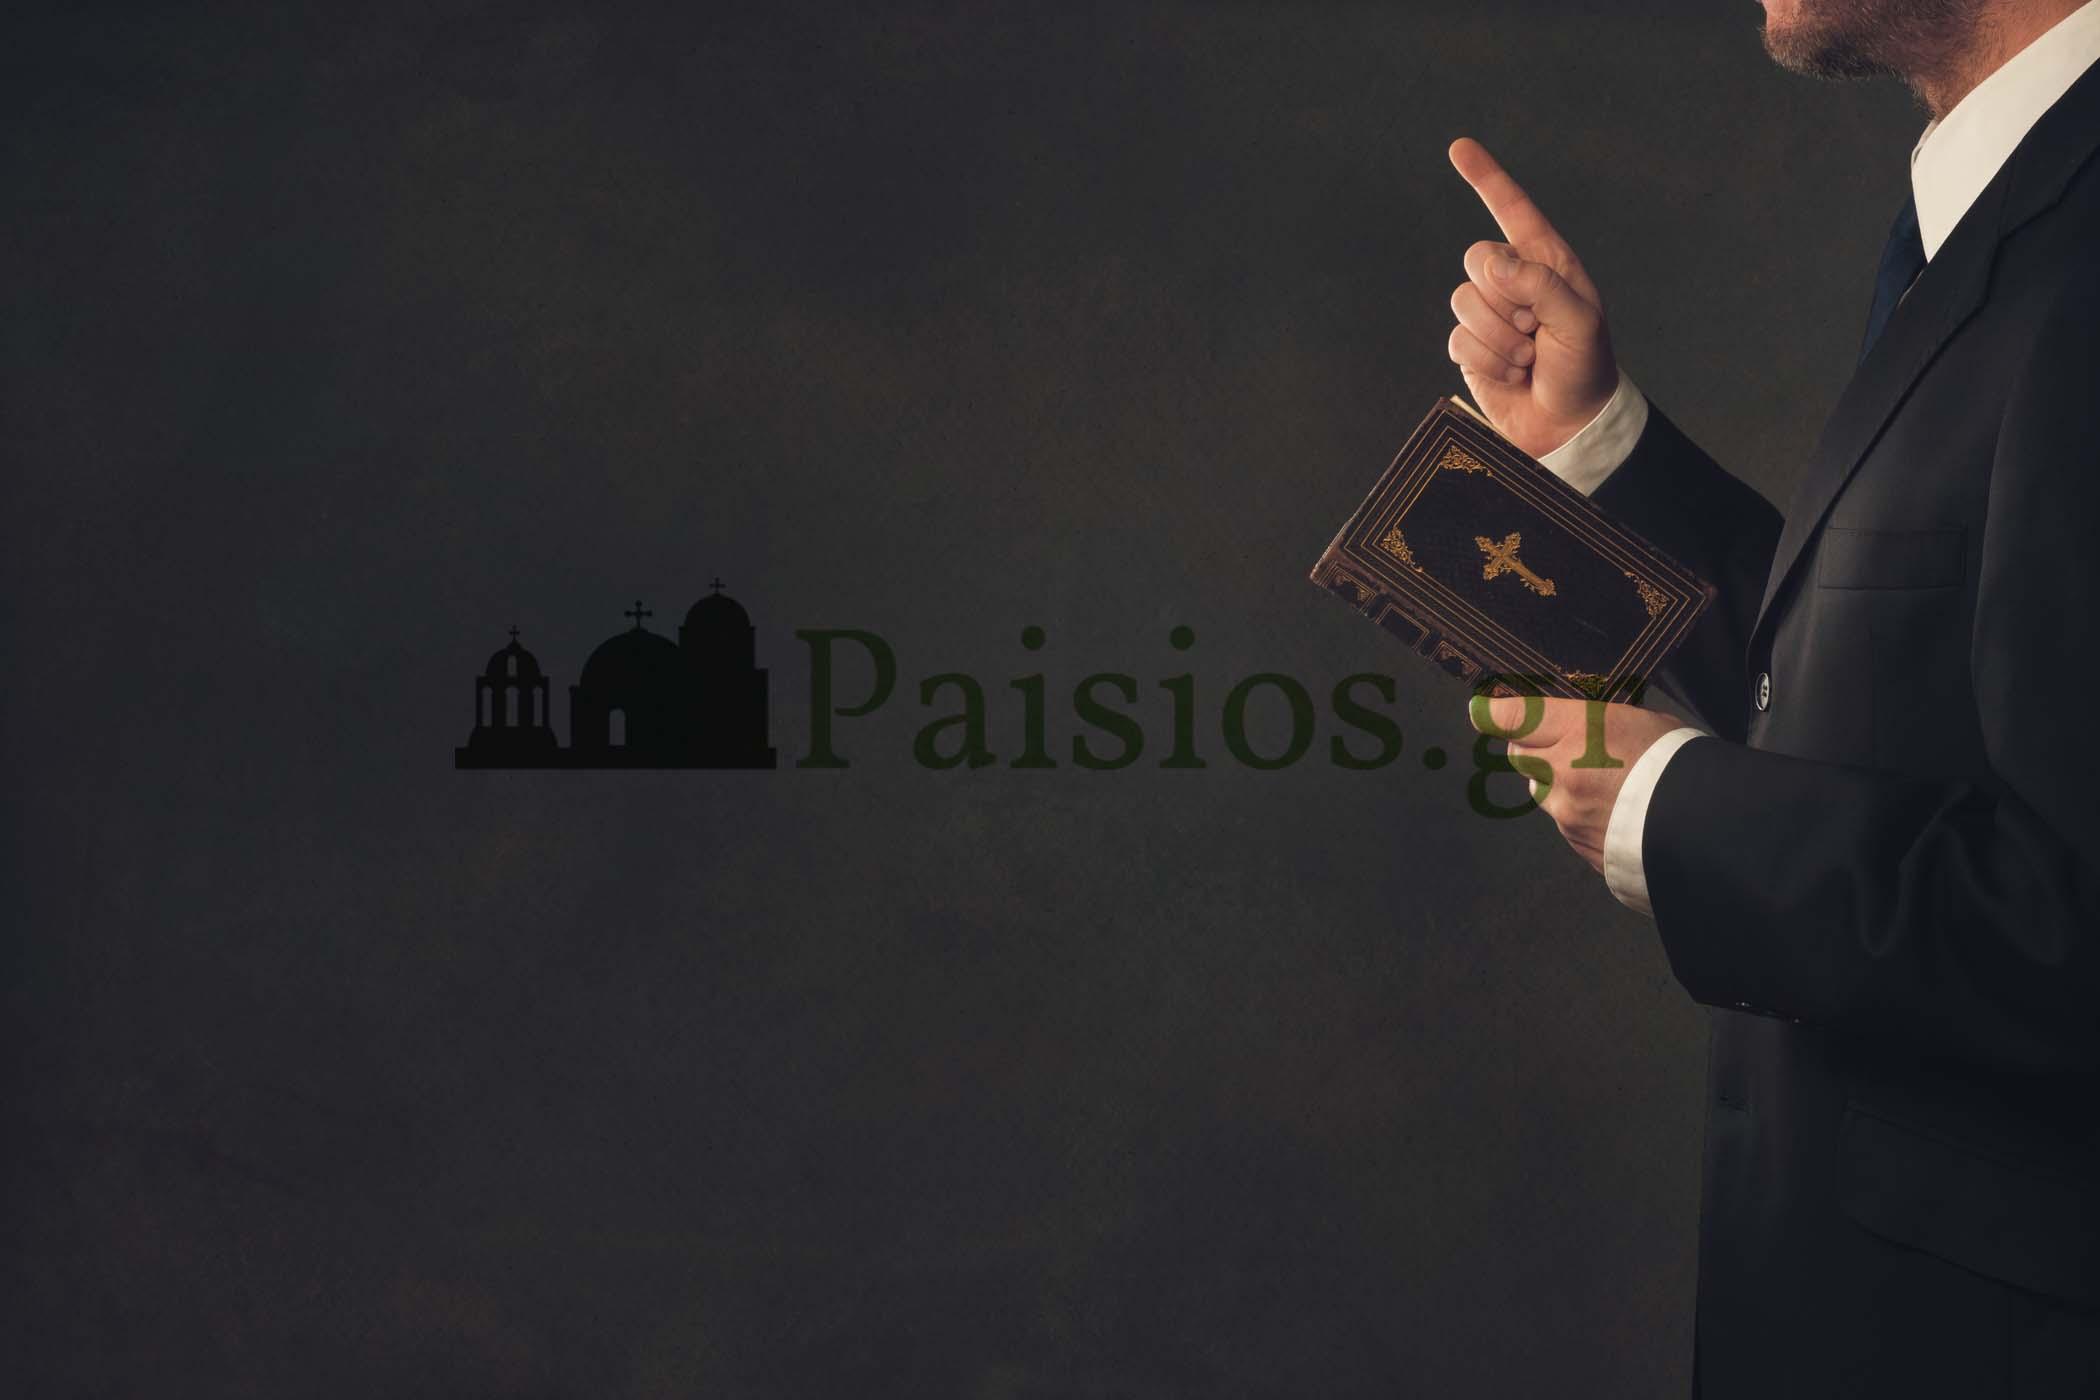 paisiosgr-didaxes- (Οργή Θεού, Πλόυσιοι, Μισθός, Παίσιος για Μισθούς, Παίσιος Αρρώστιες, Ιωβ, Ψαλμός, Ανομία, Αμαρτωλοί